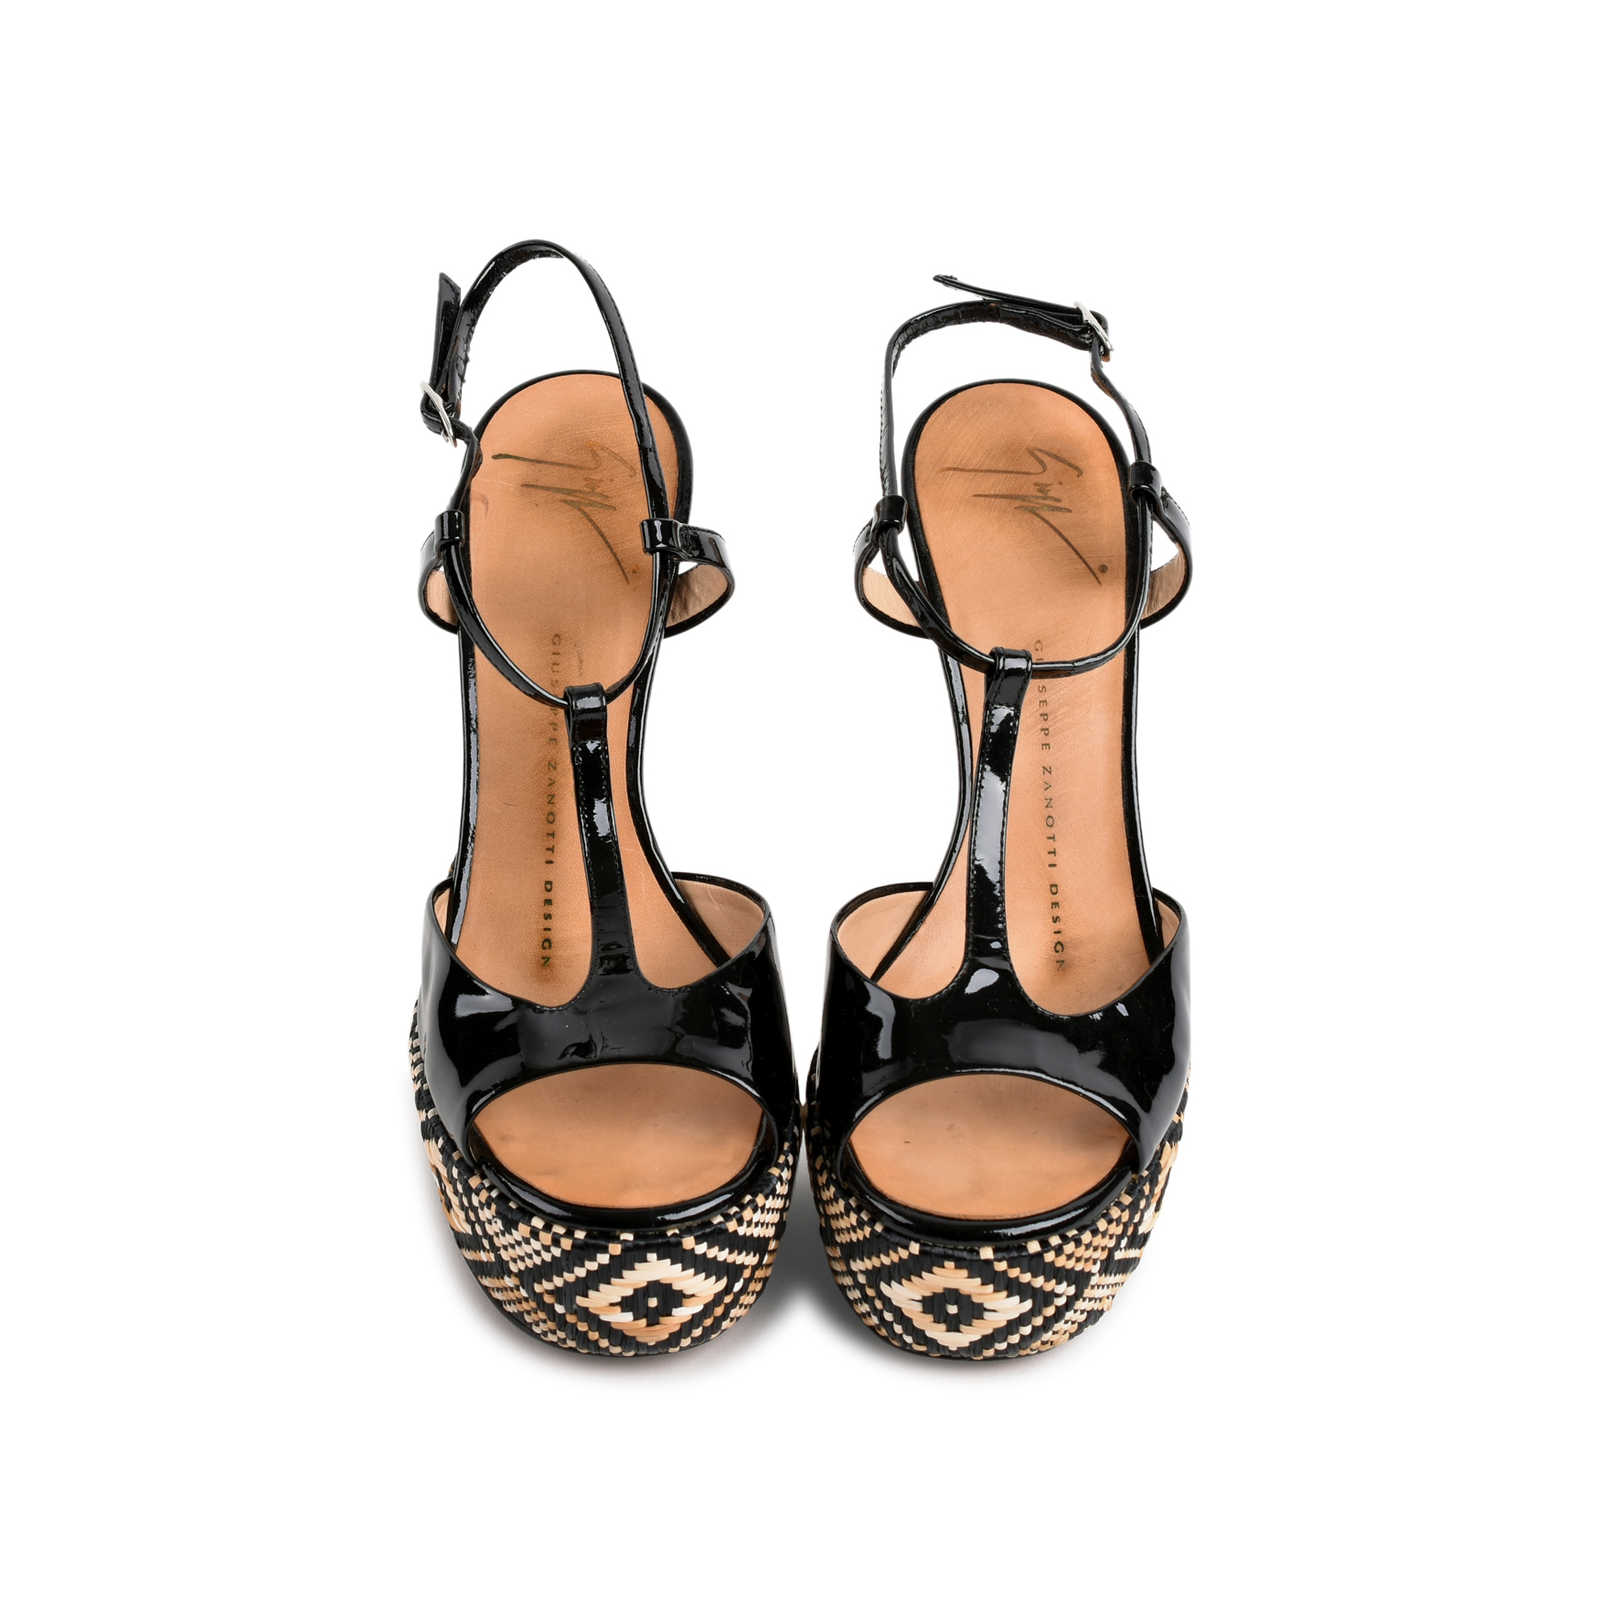 7563913e5e4a Authentic Second Hand Giuseppe Zanotti Tribal Black Patent Sandals (PSS-080-00266)  ...